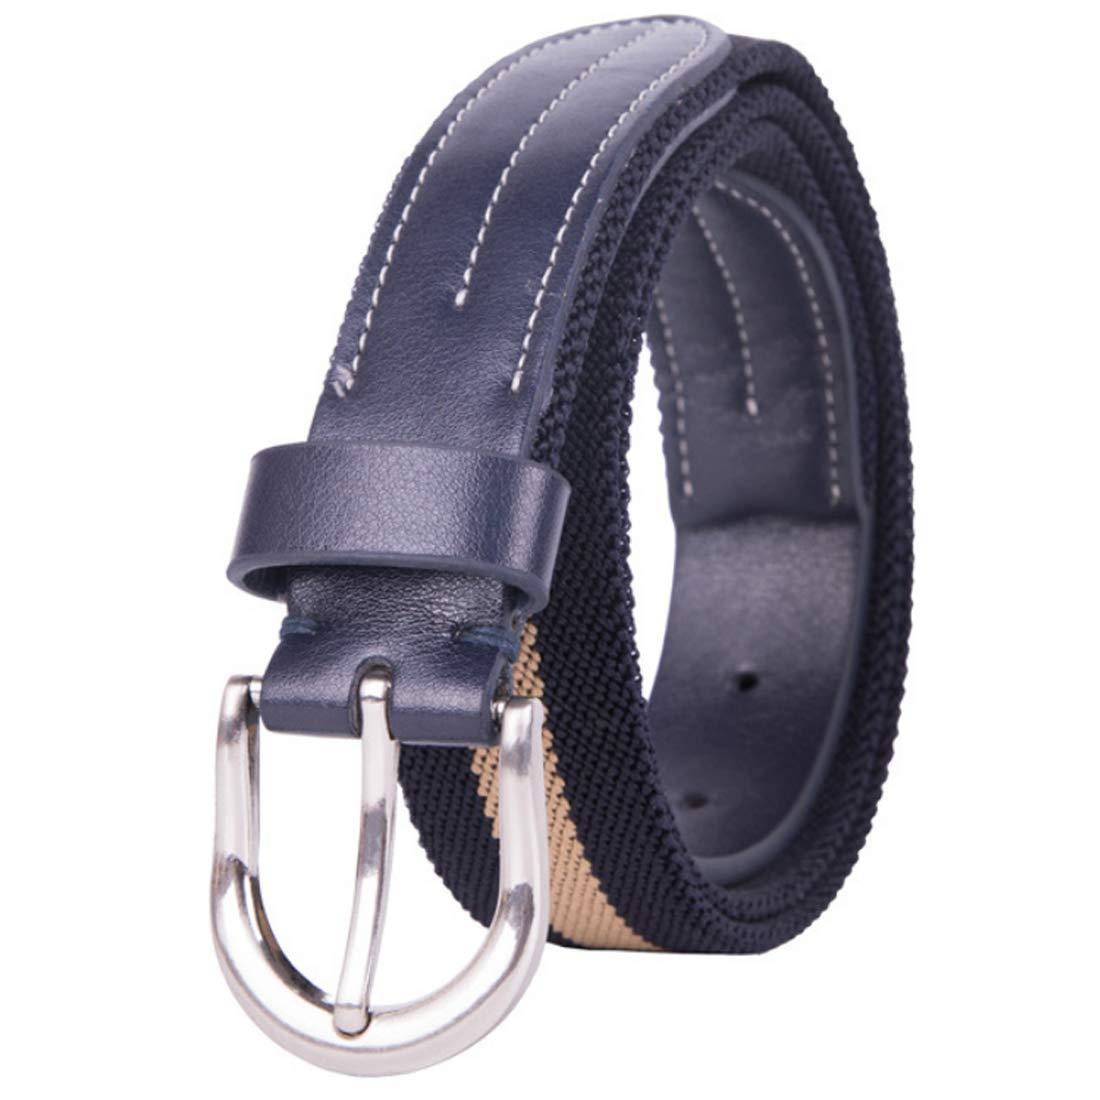 Aiweijia Unisex stretch belt simple striped fashion casual sports belt